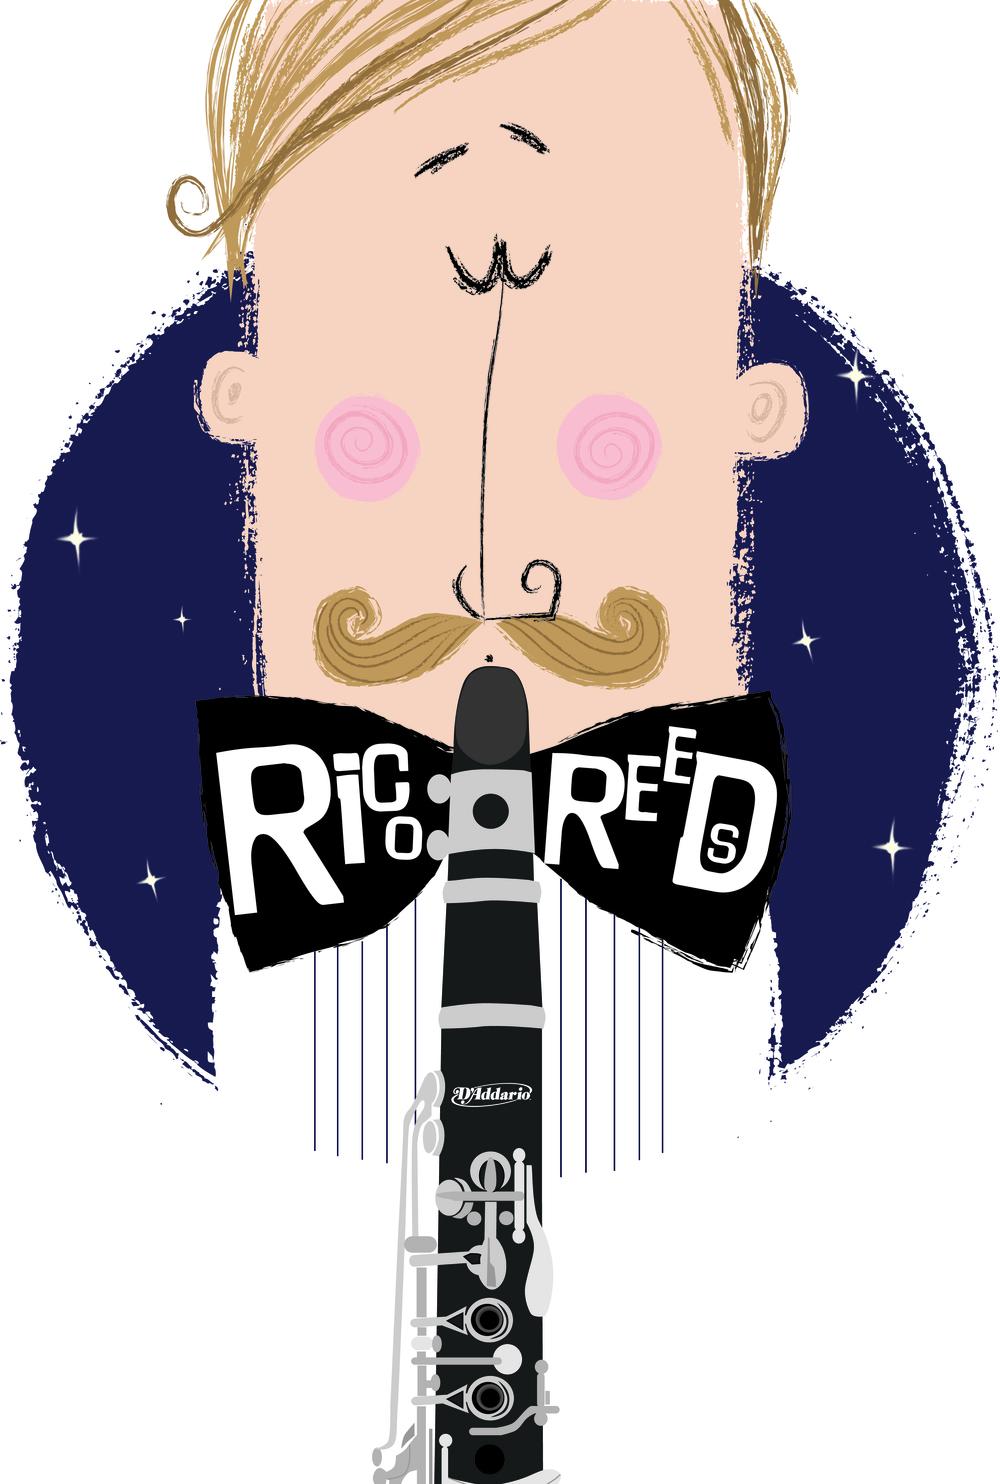 Rico reeds man.jpg